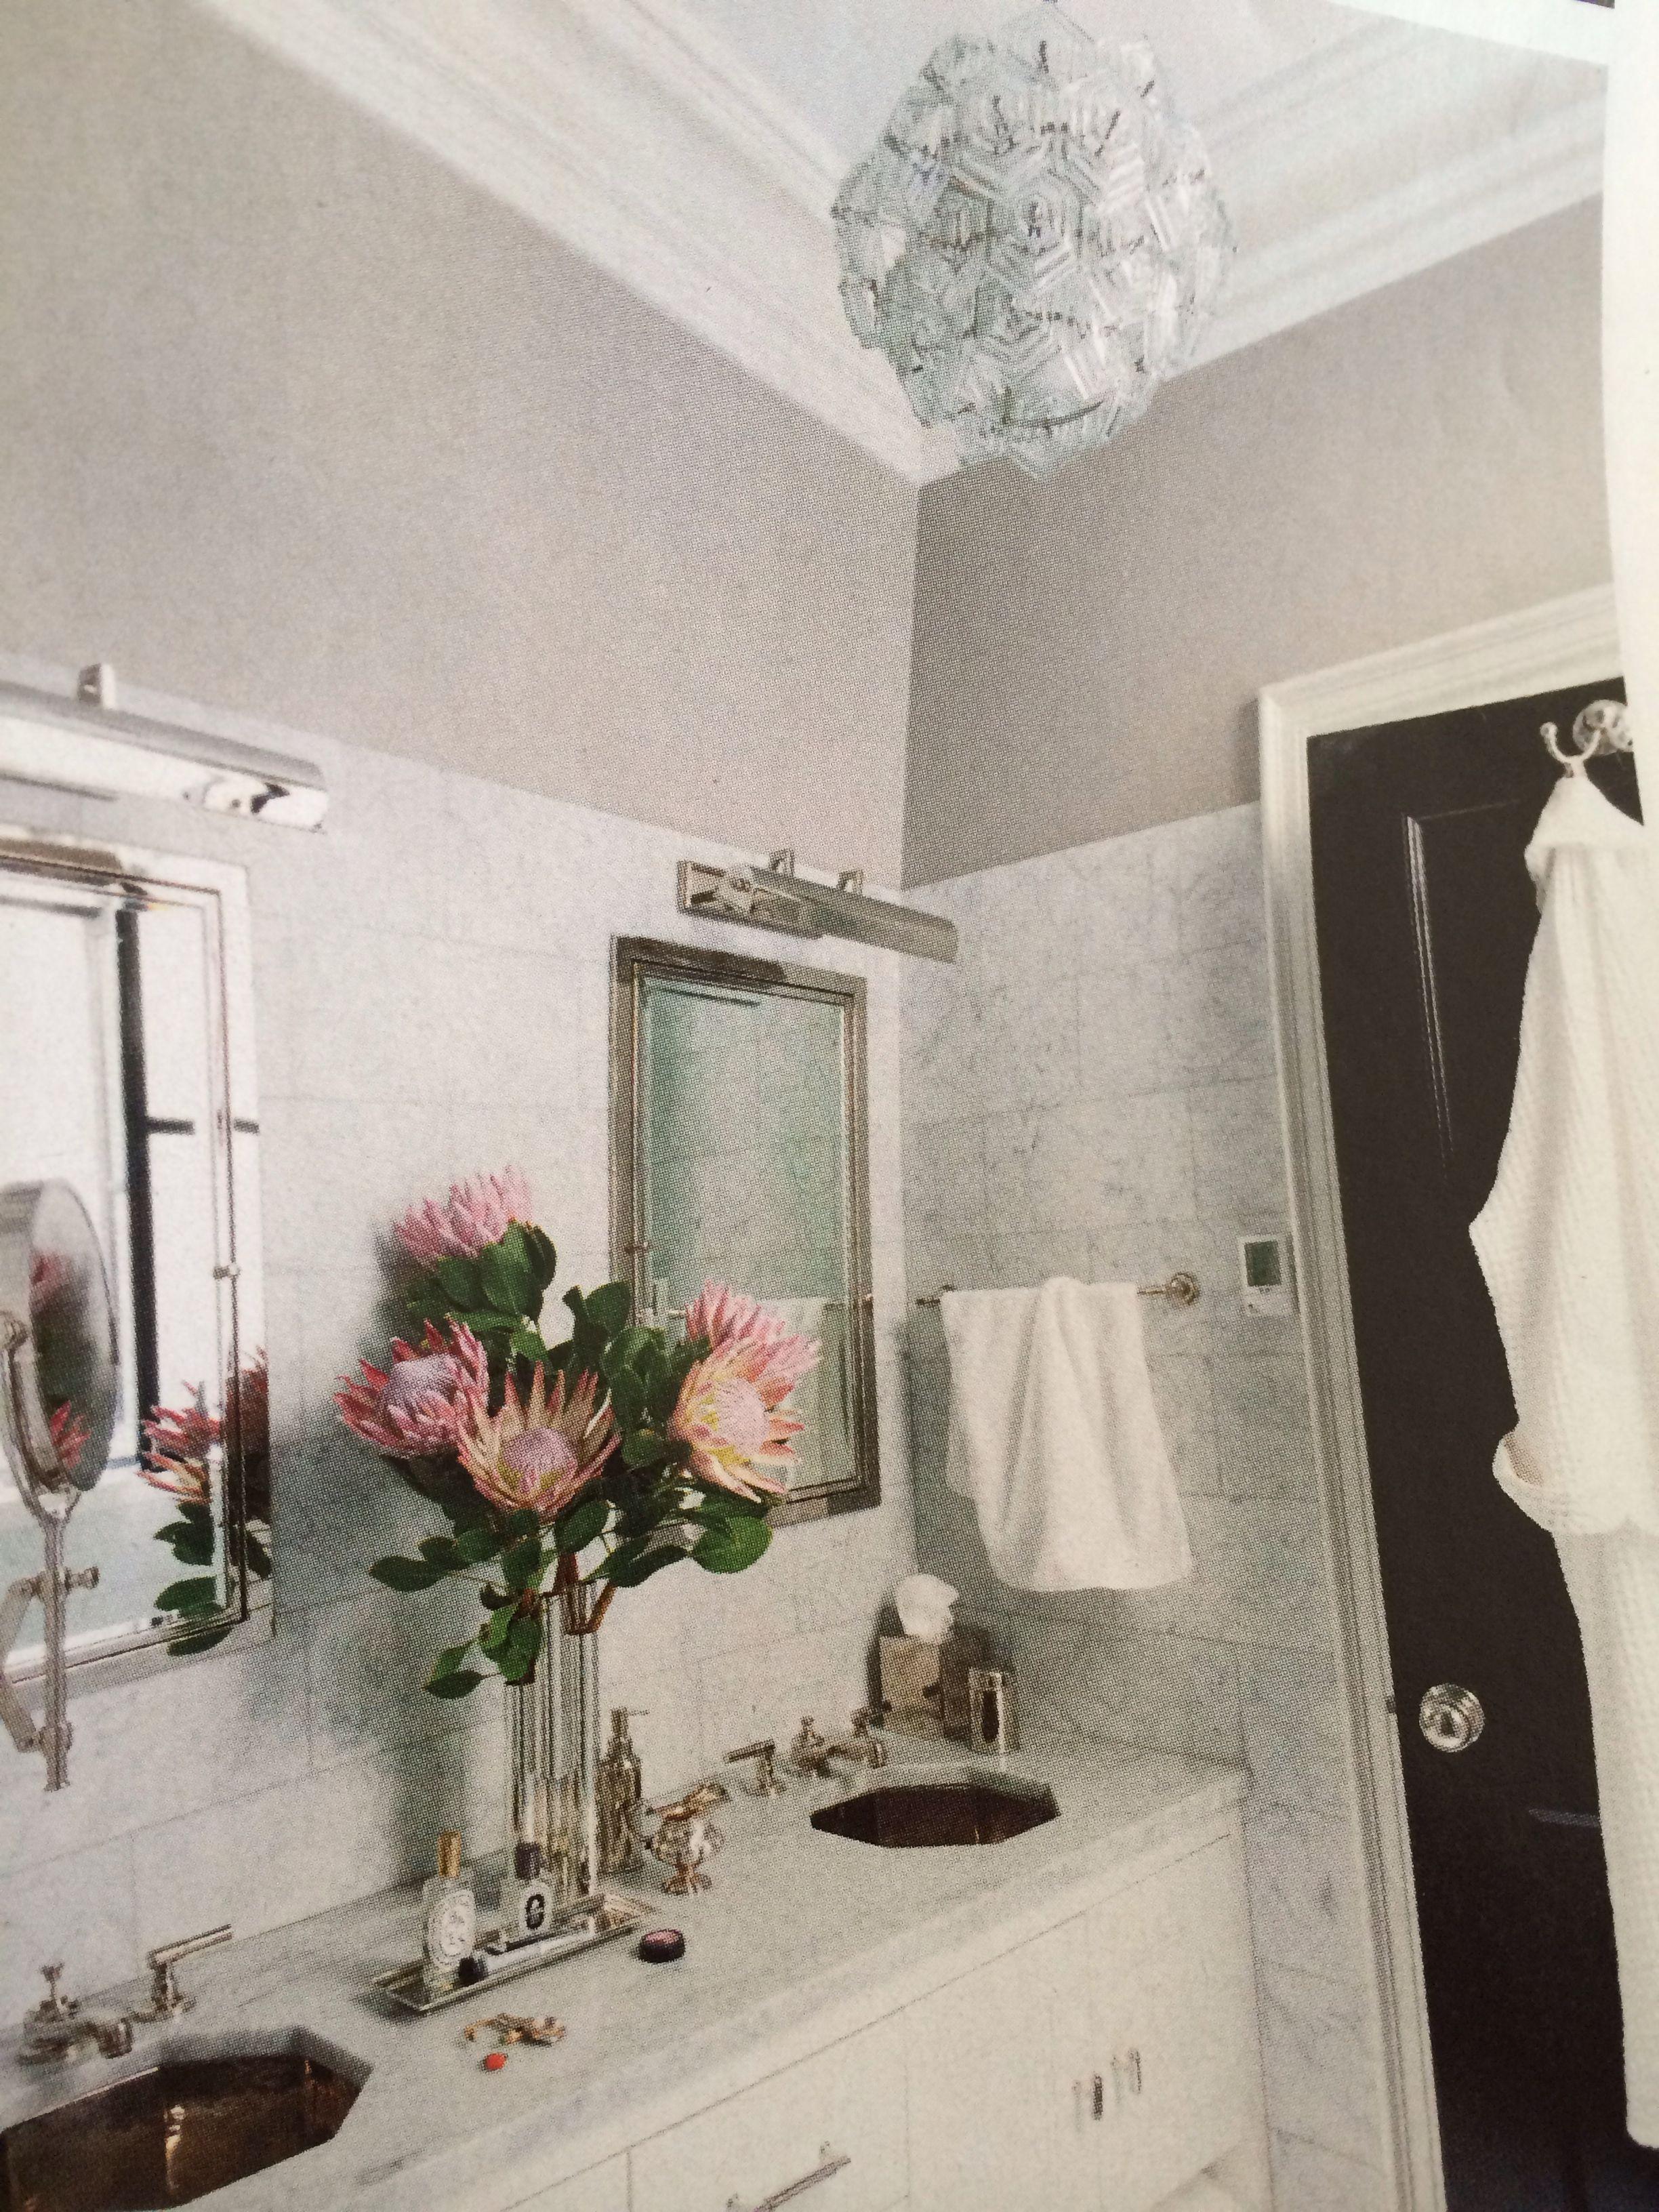 benjamin moore smoke embers paint colors pinterest. Black Bedroom Furniture Sets. Home Design Ideas